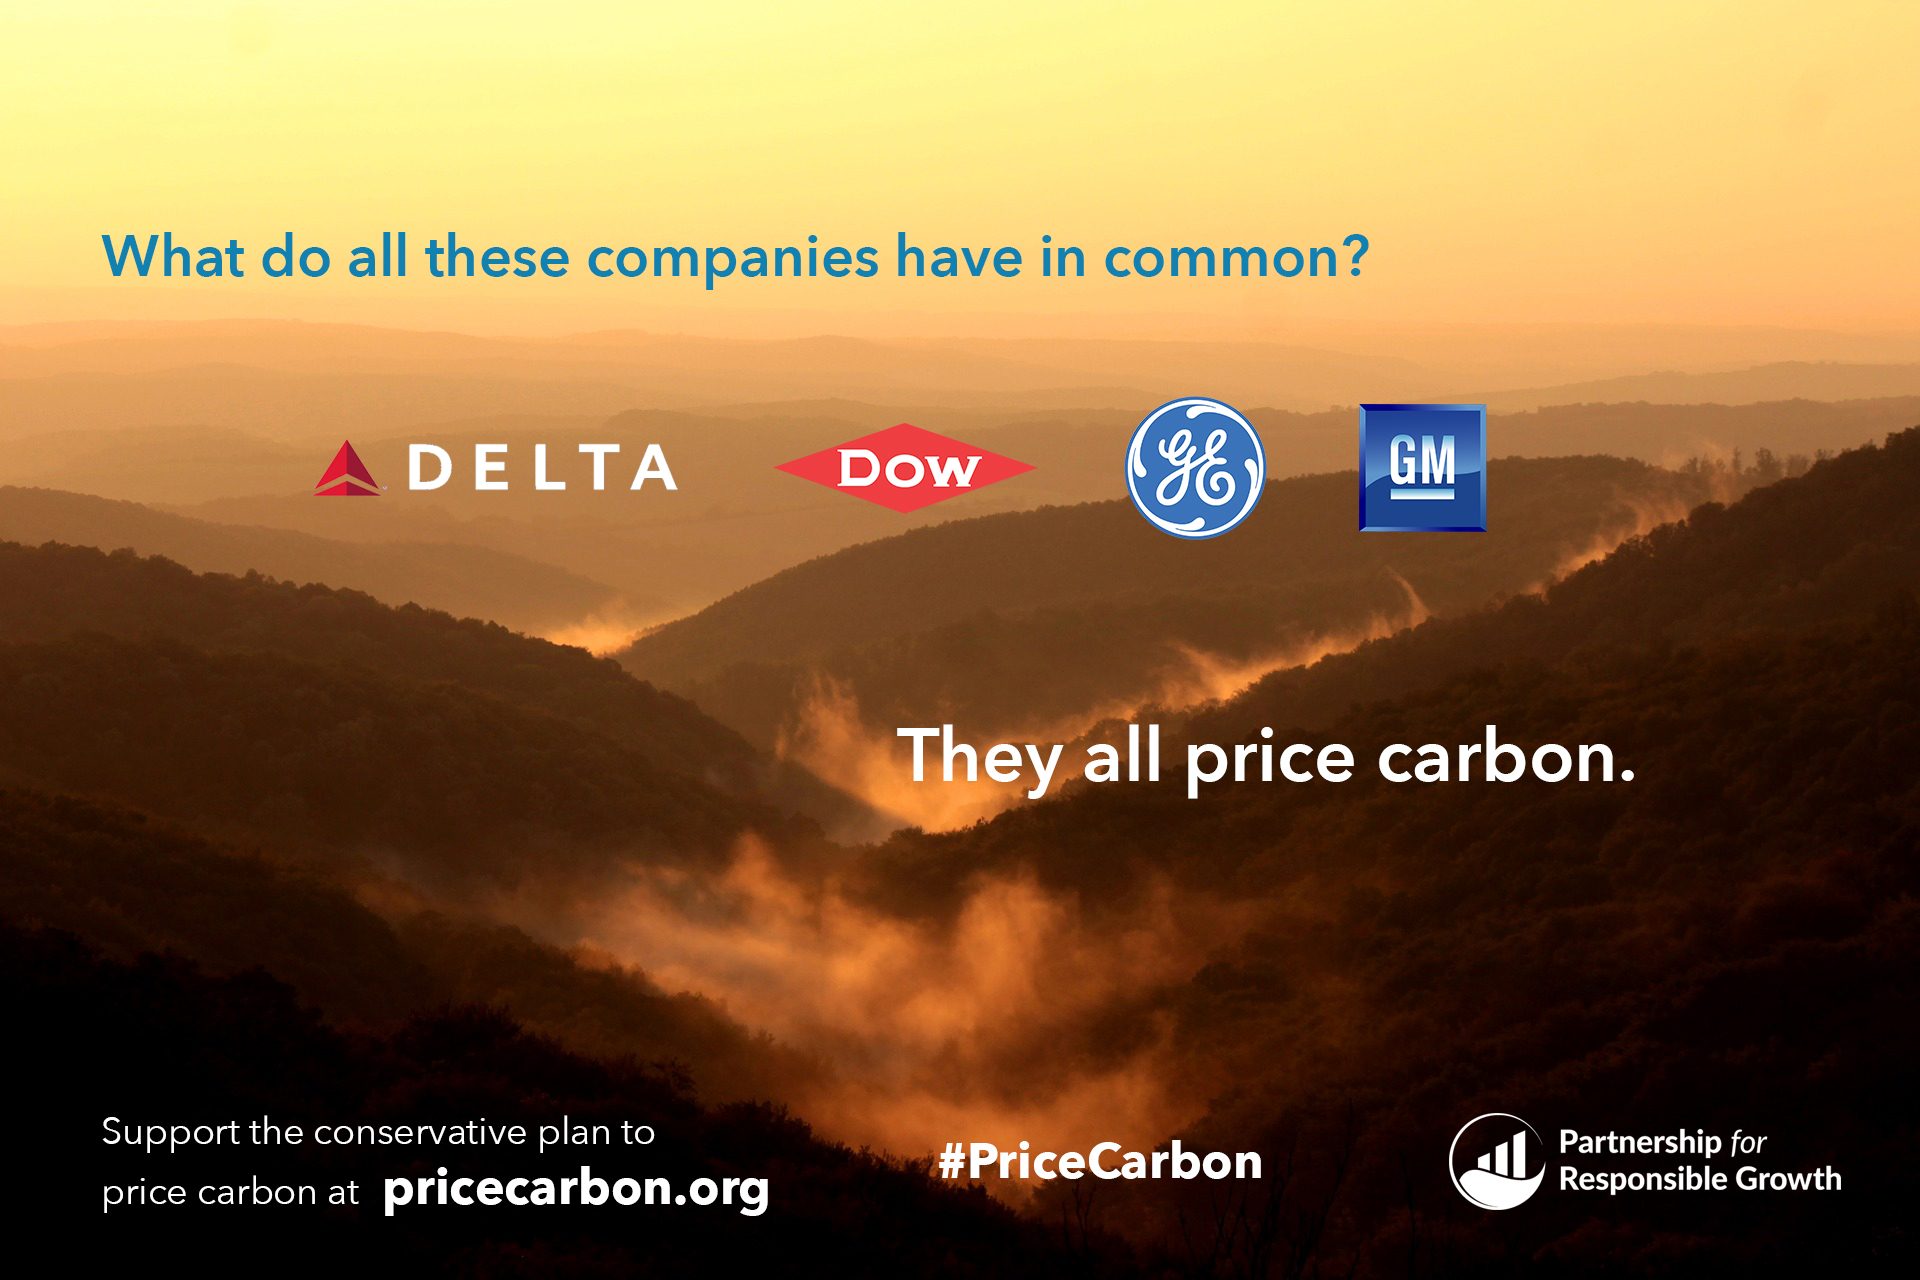 corporate-common_companies.jpg